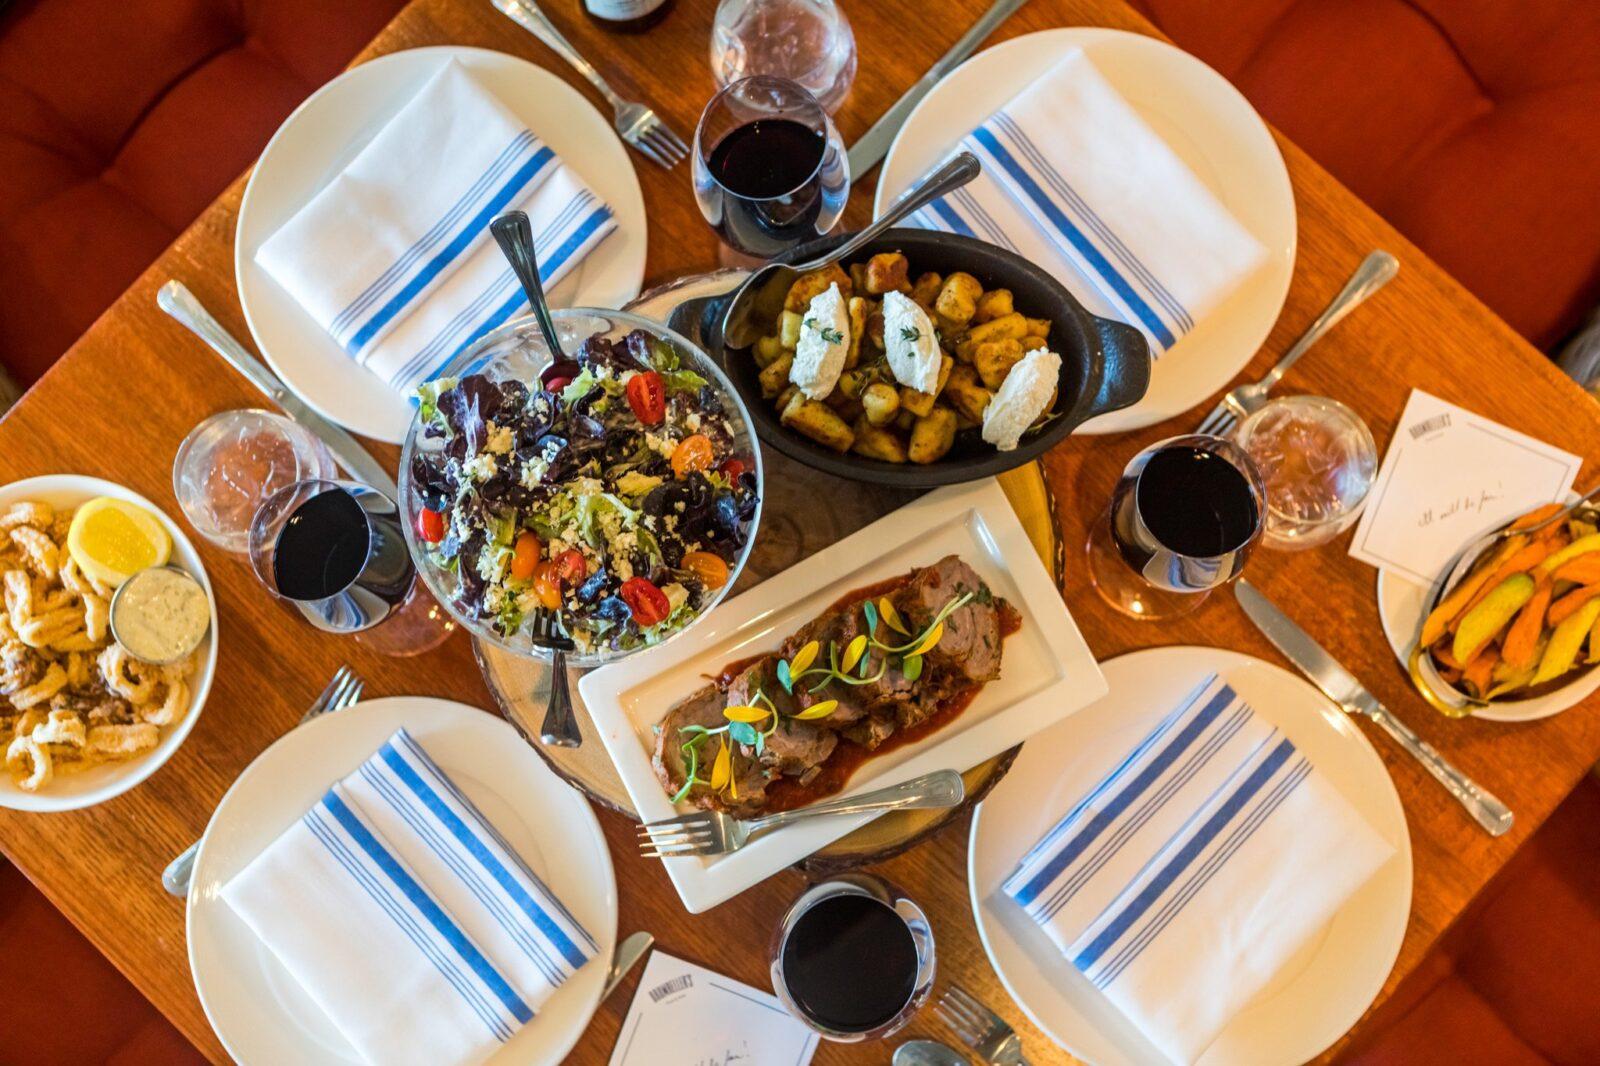 Sunday Supper Event in Richland, WA